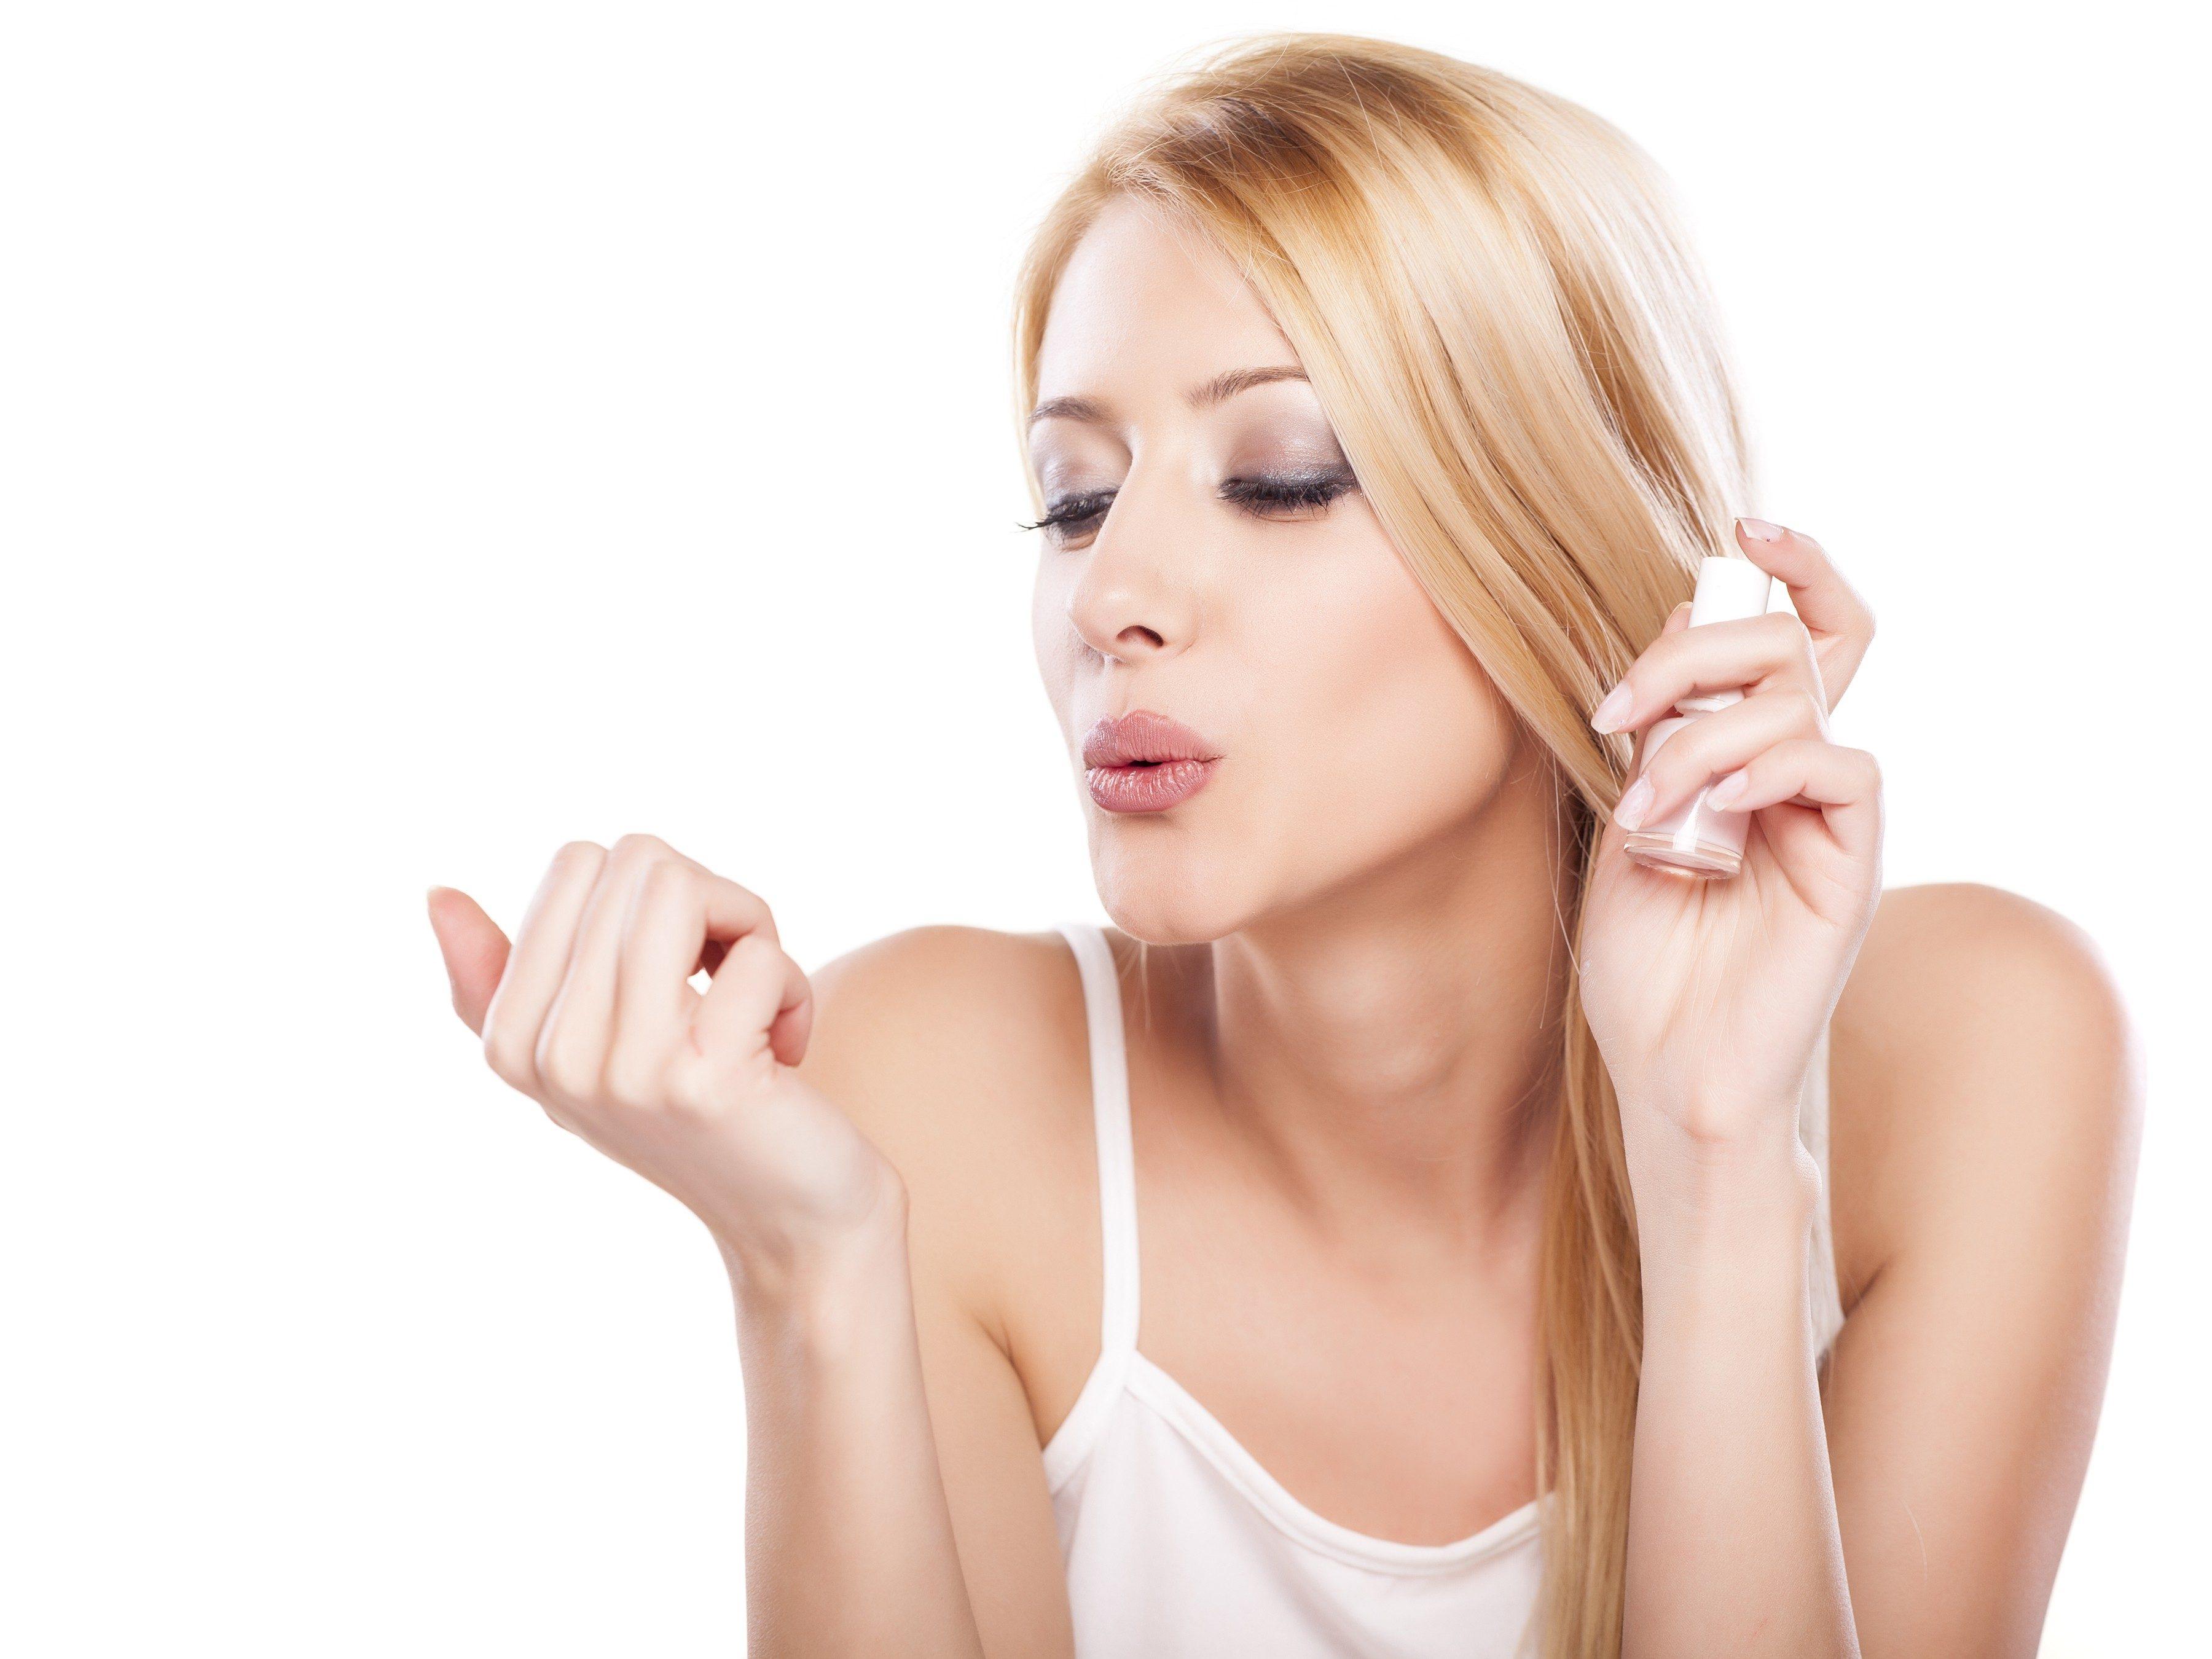 Nail Polish Tip #5: Let Your Nails Dry